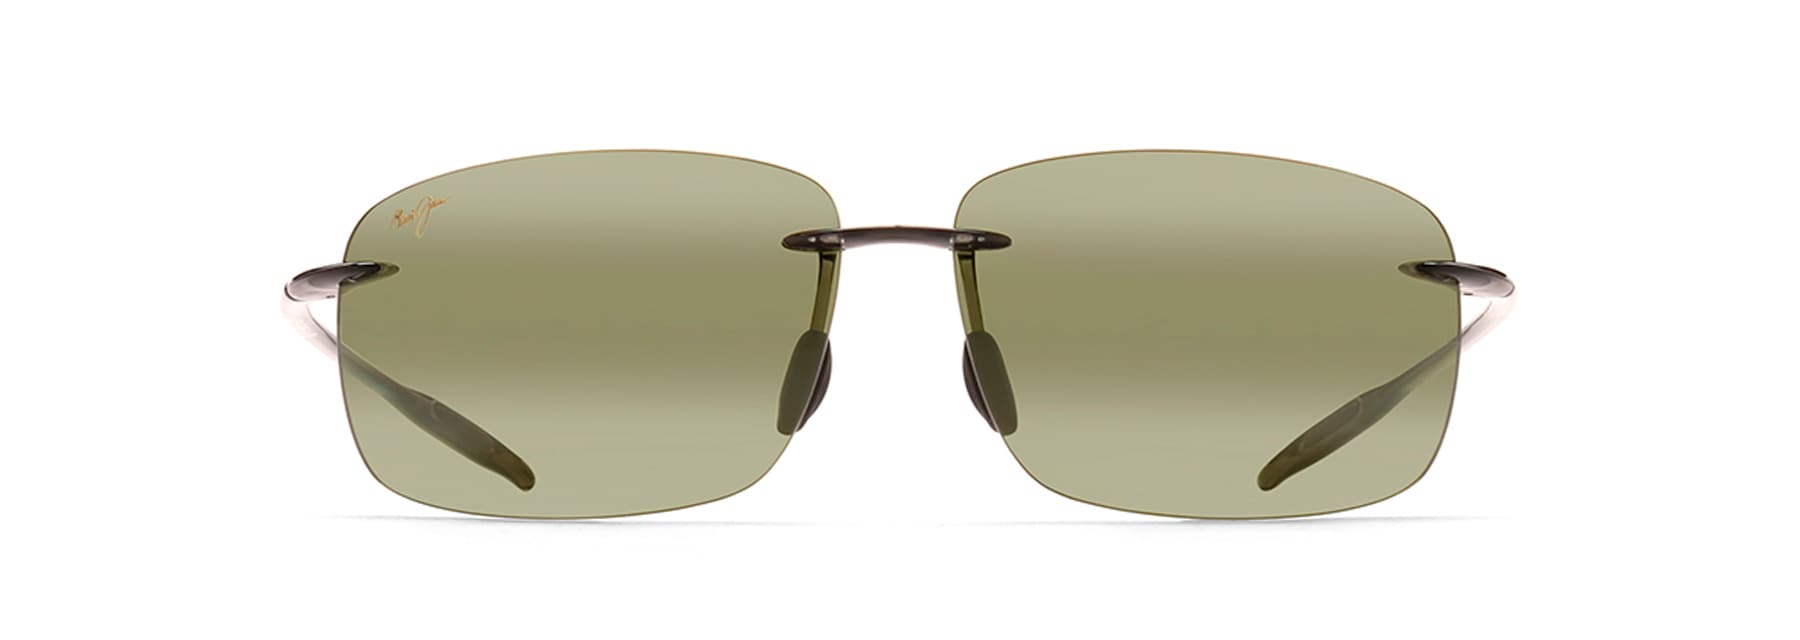 667700f476 Breakwall Polarized Sunglasses